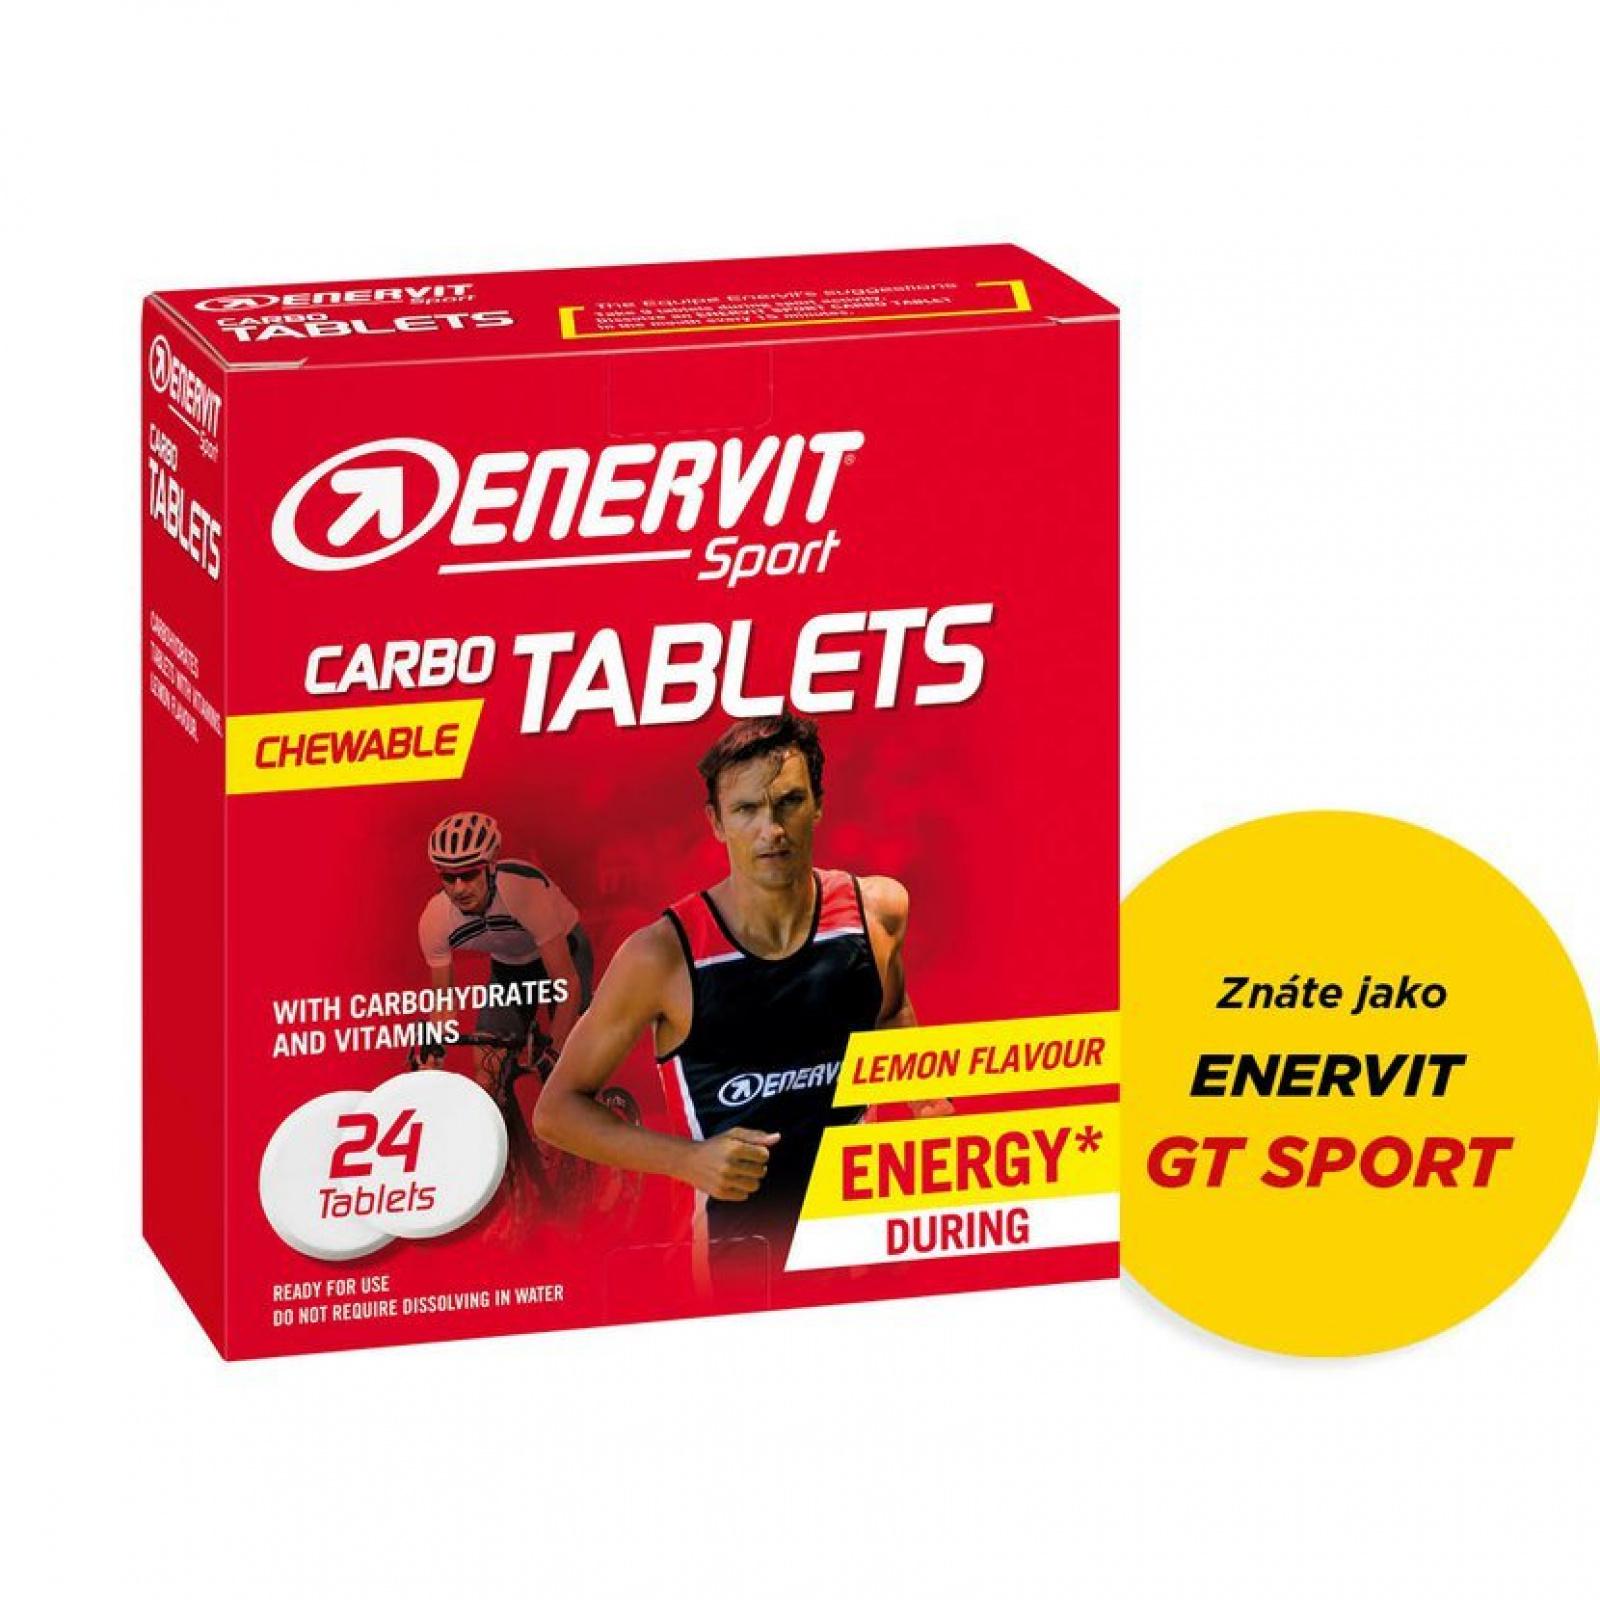 https://www.badec.store/produkty_img/enervit-carbo-tablets1602782765L.jpg